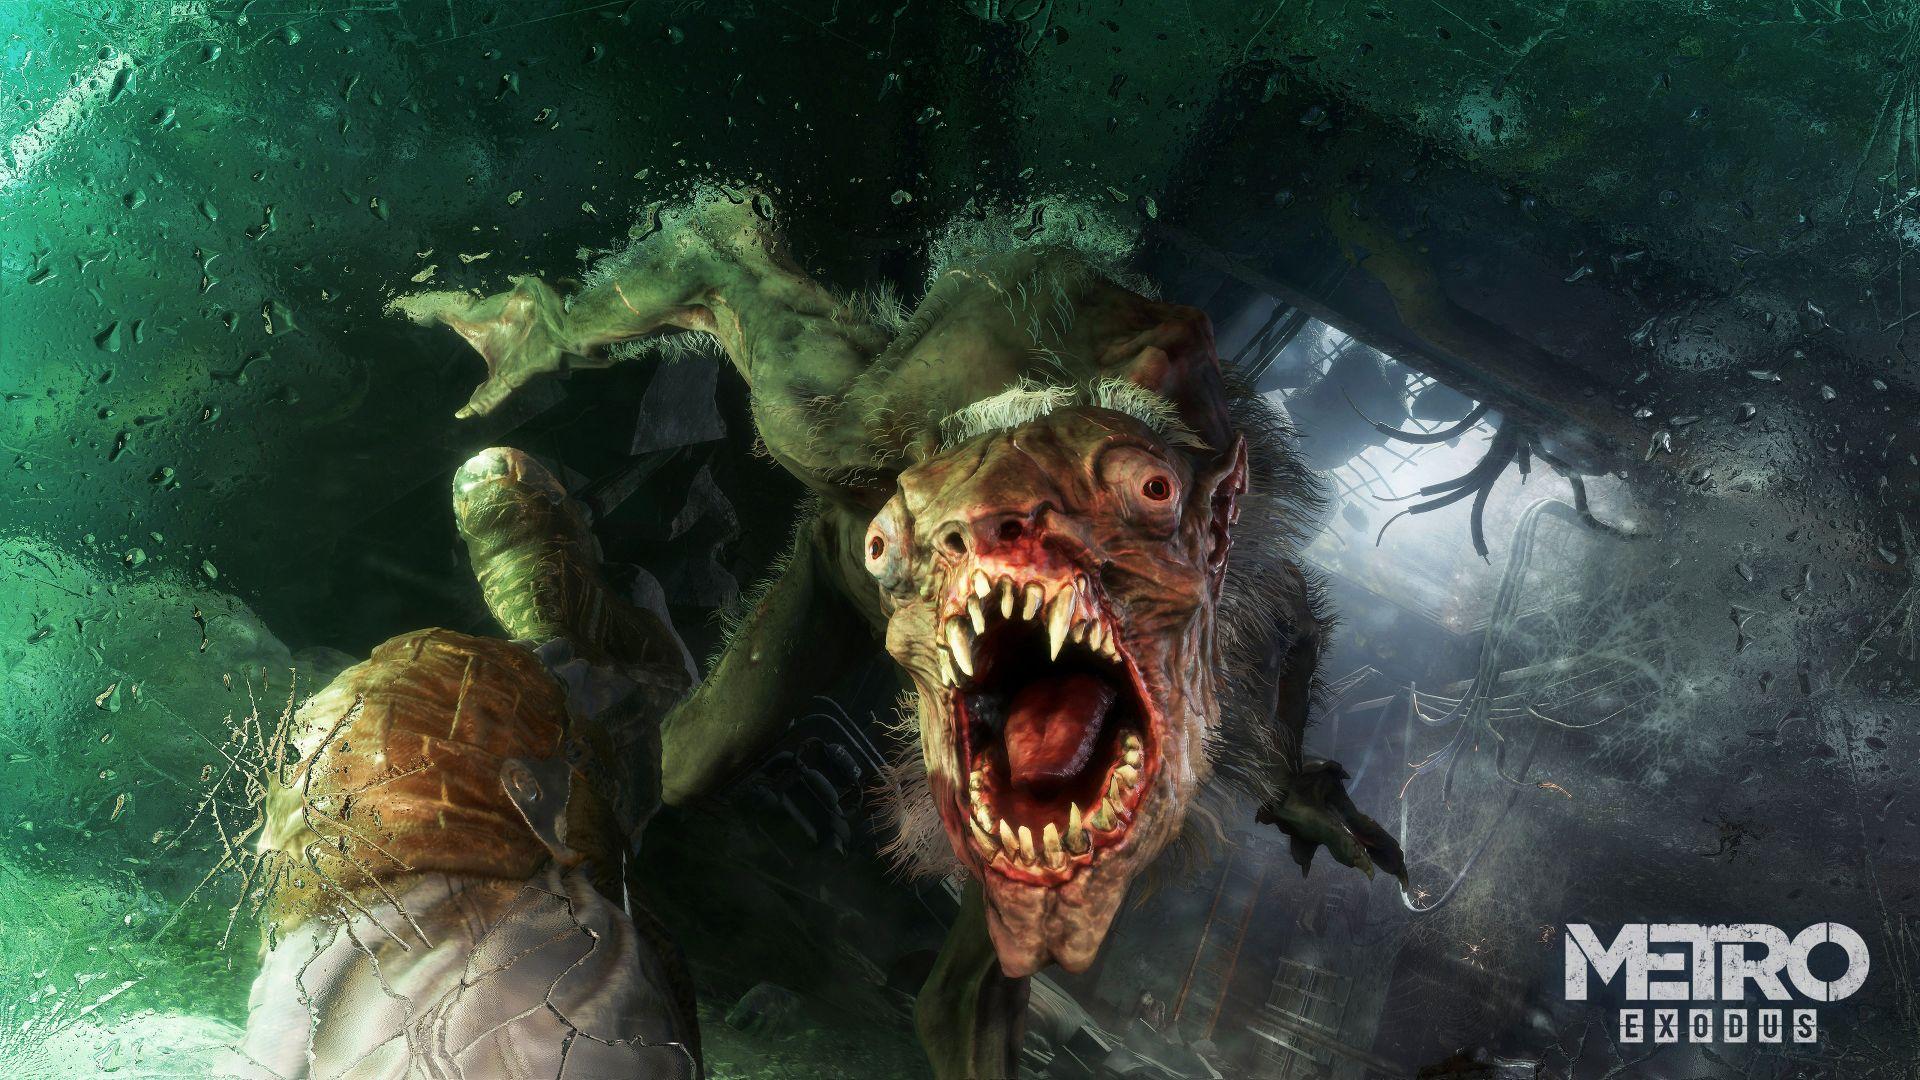 Wallpaper Metro: Exodus E3, 2017 game, creature, 4k